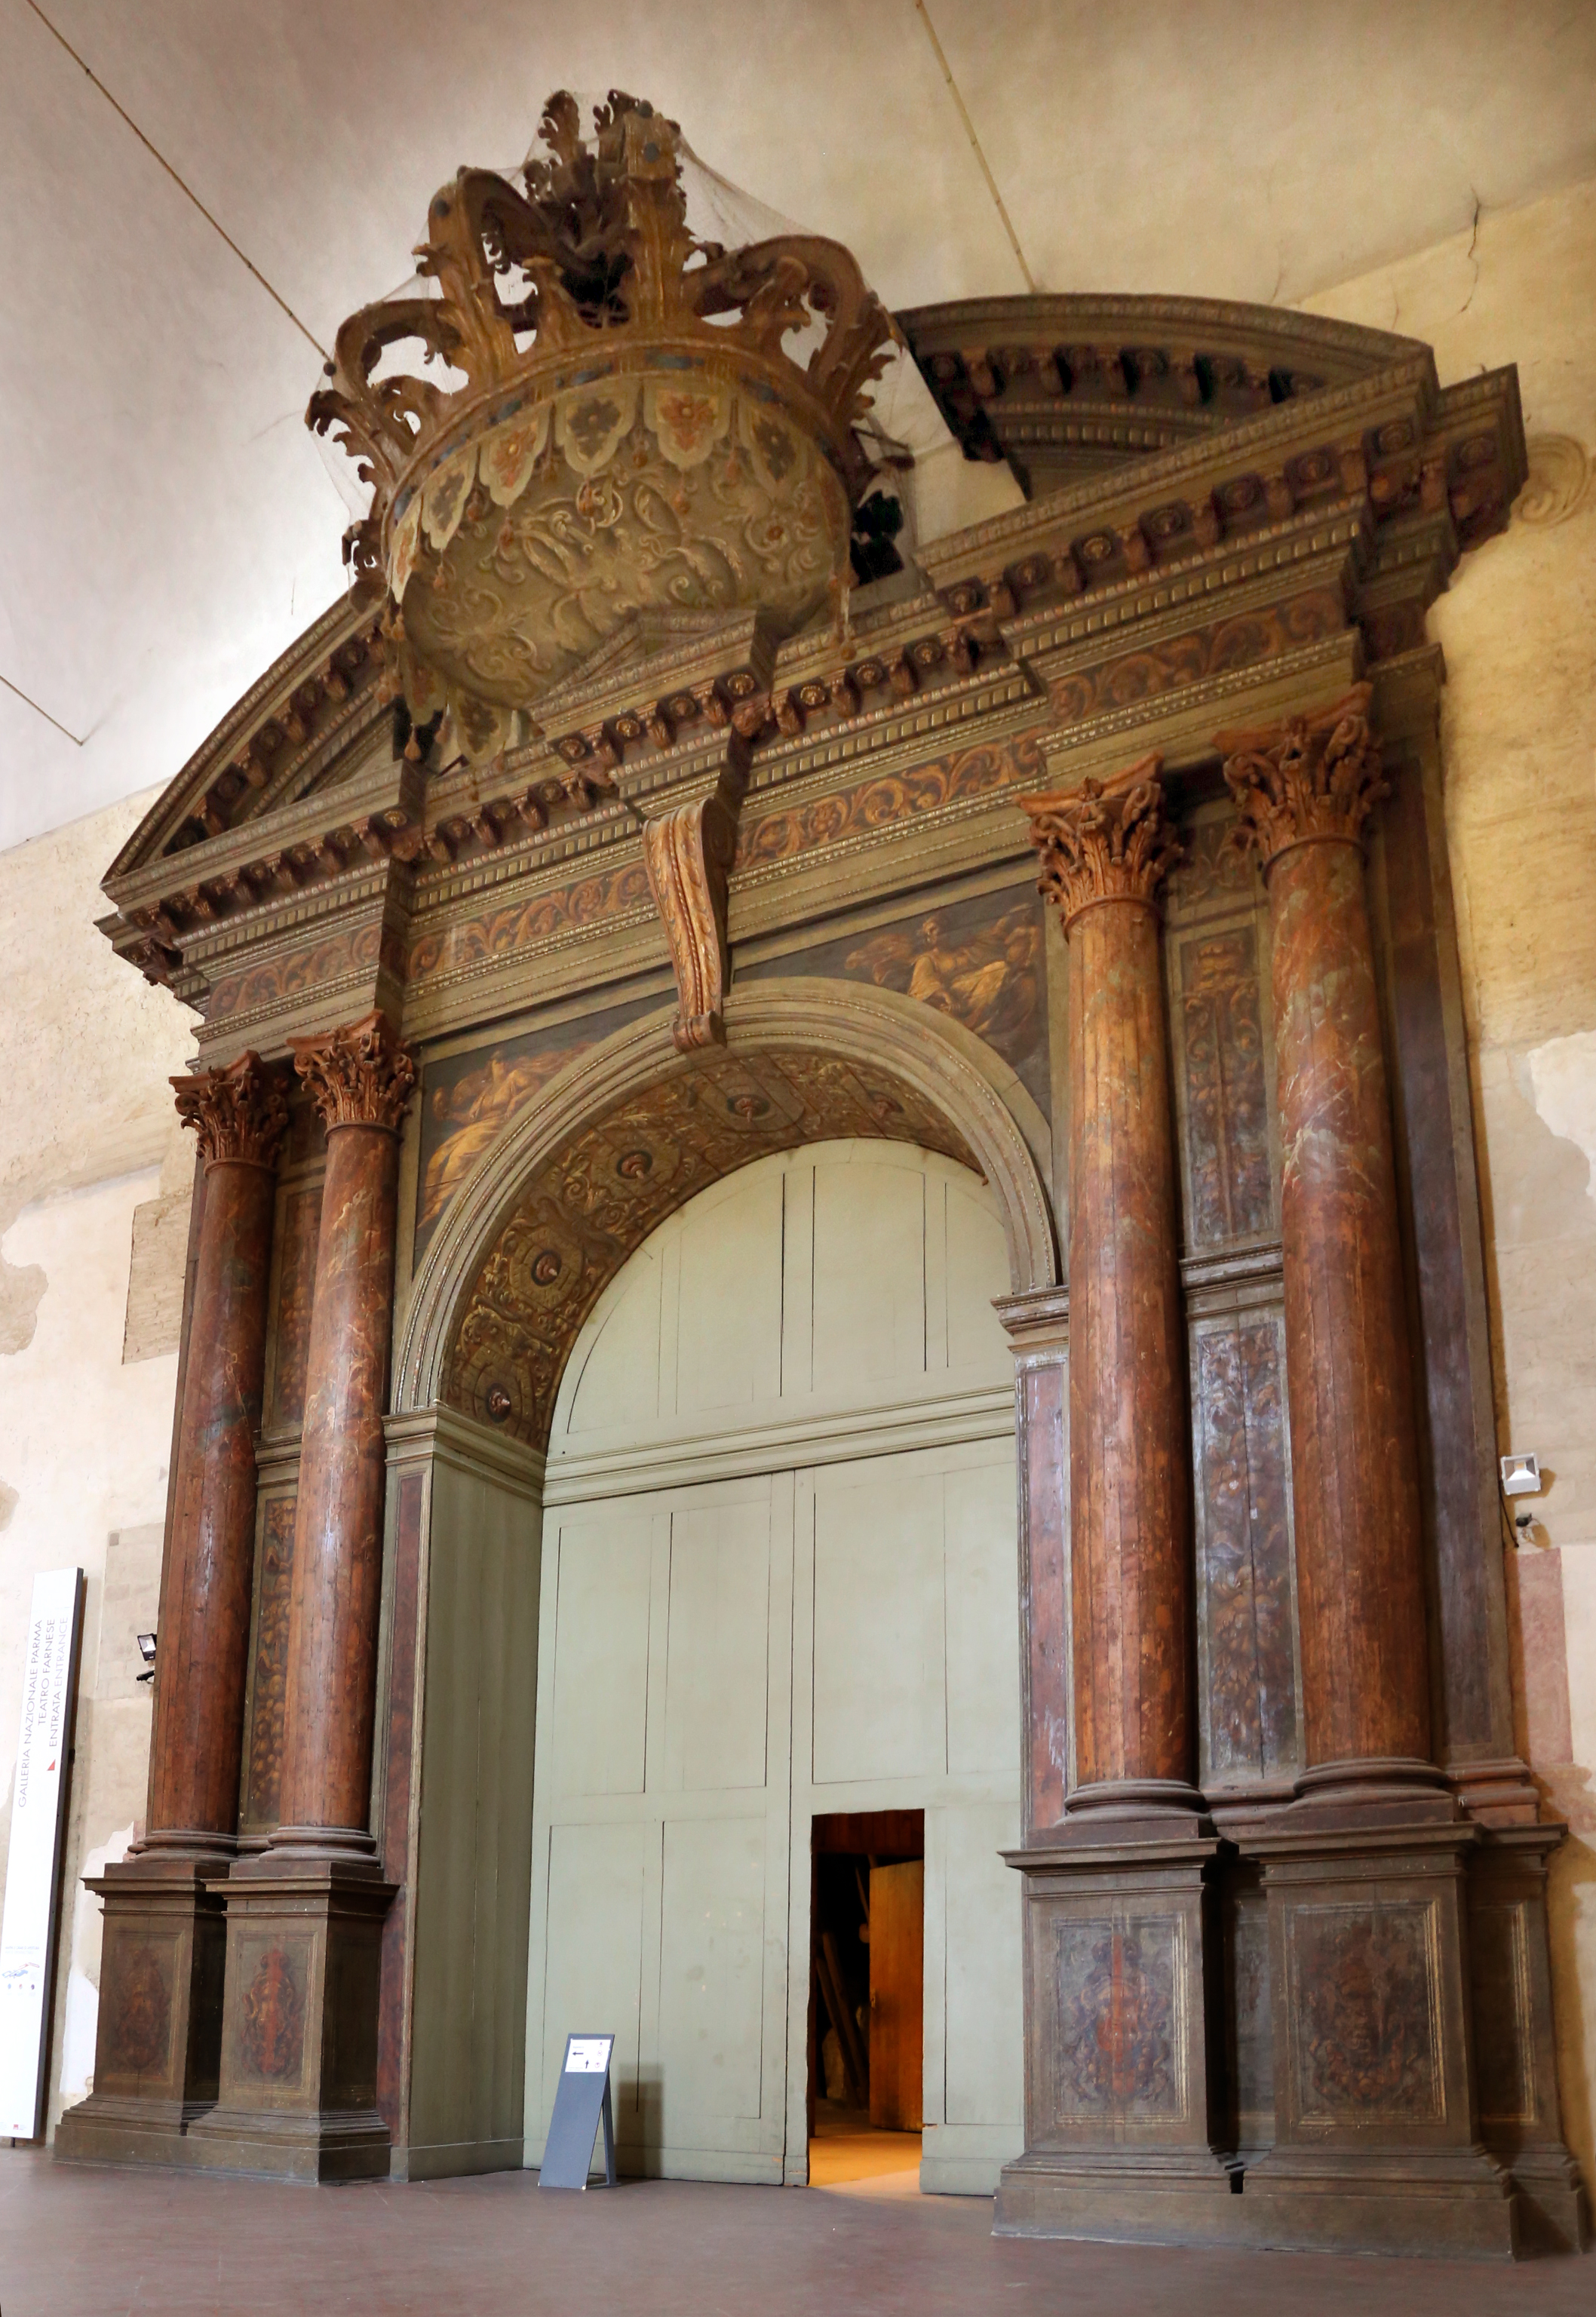 Ingresso del Teatro Farnese